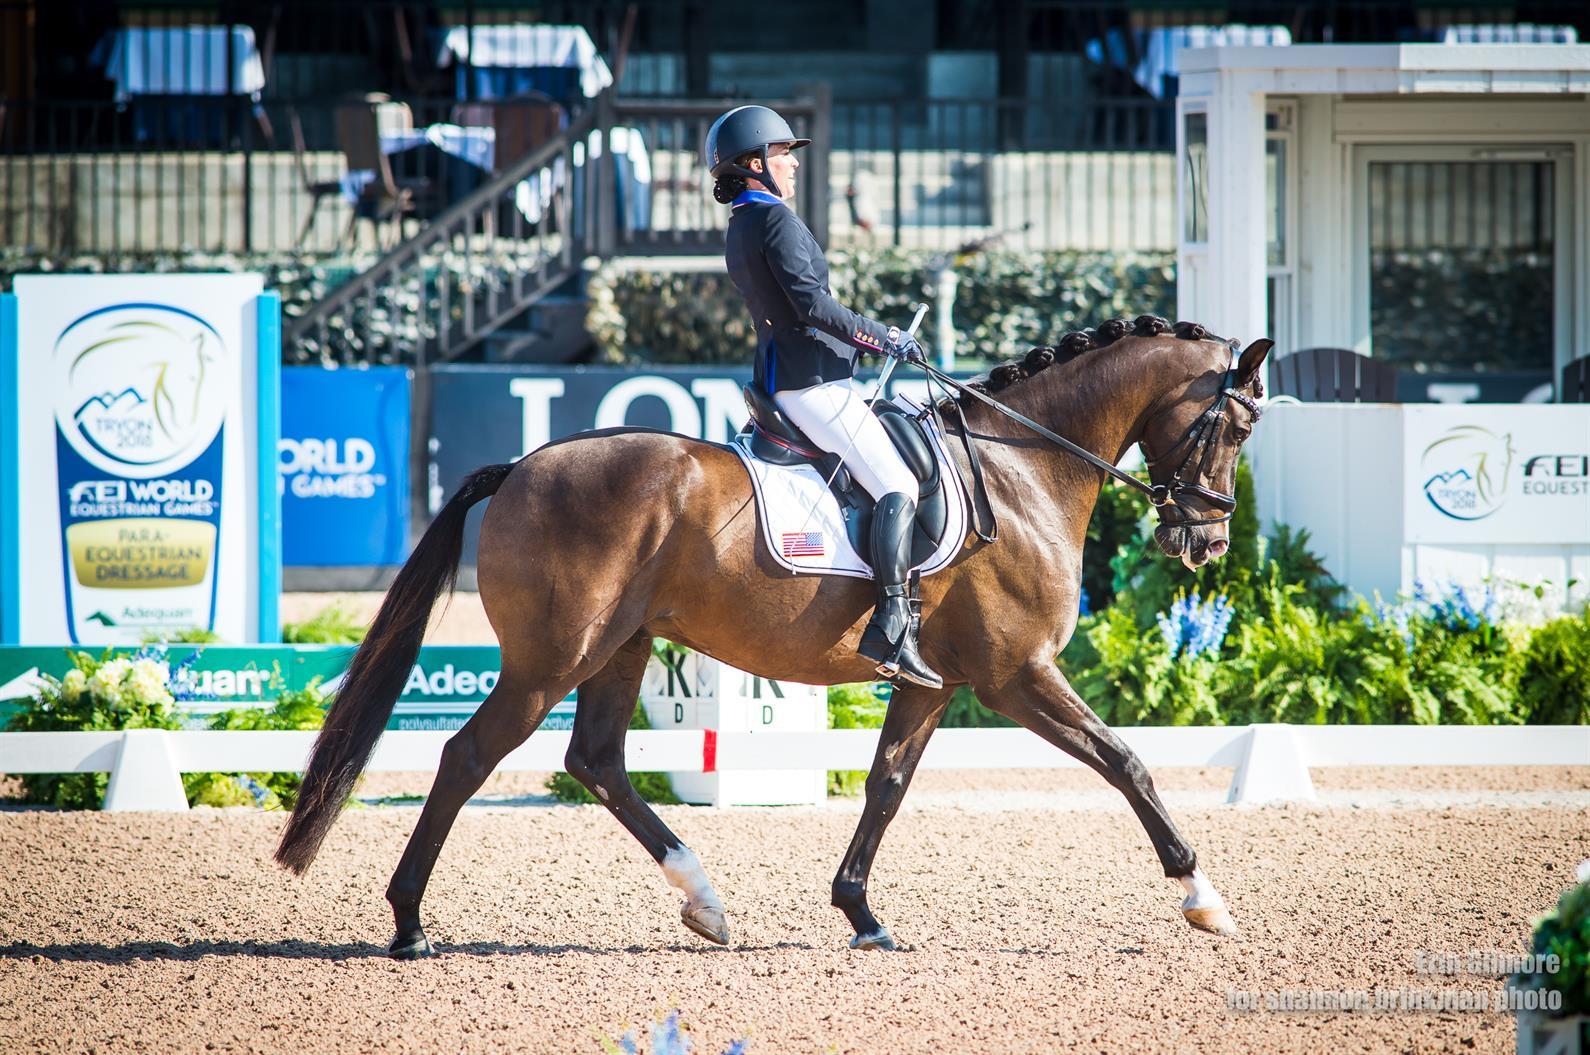 U S Para Equestrian Dressage Team Presented By Deloitte